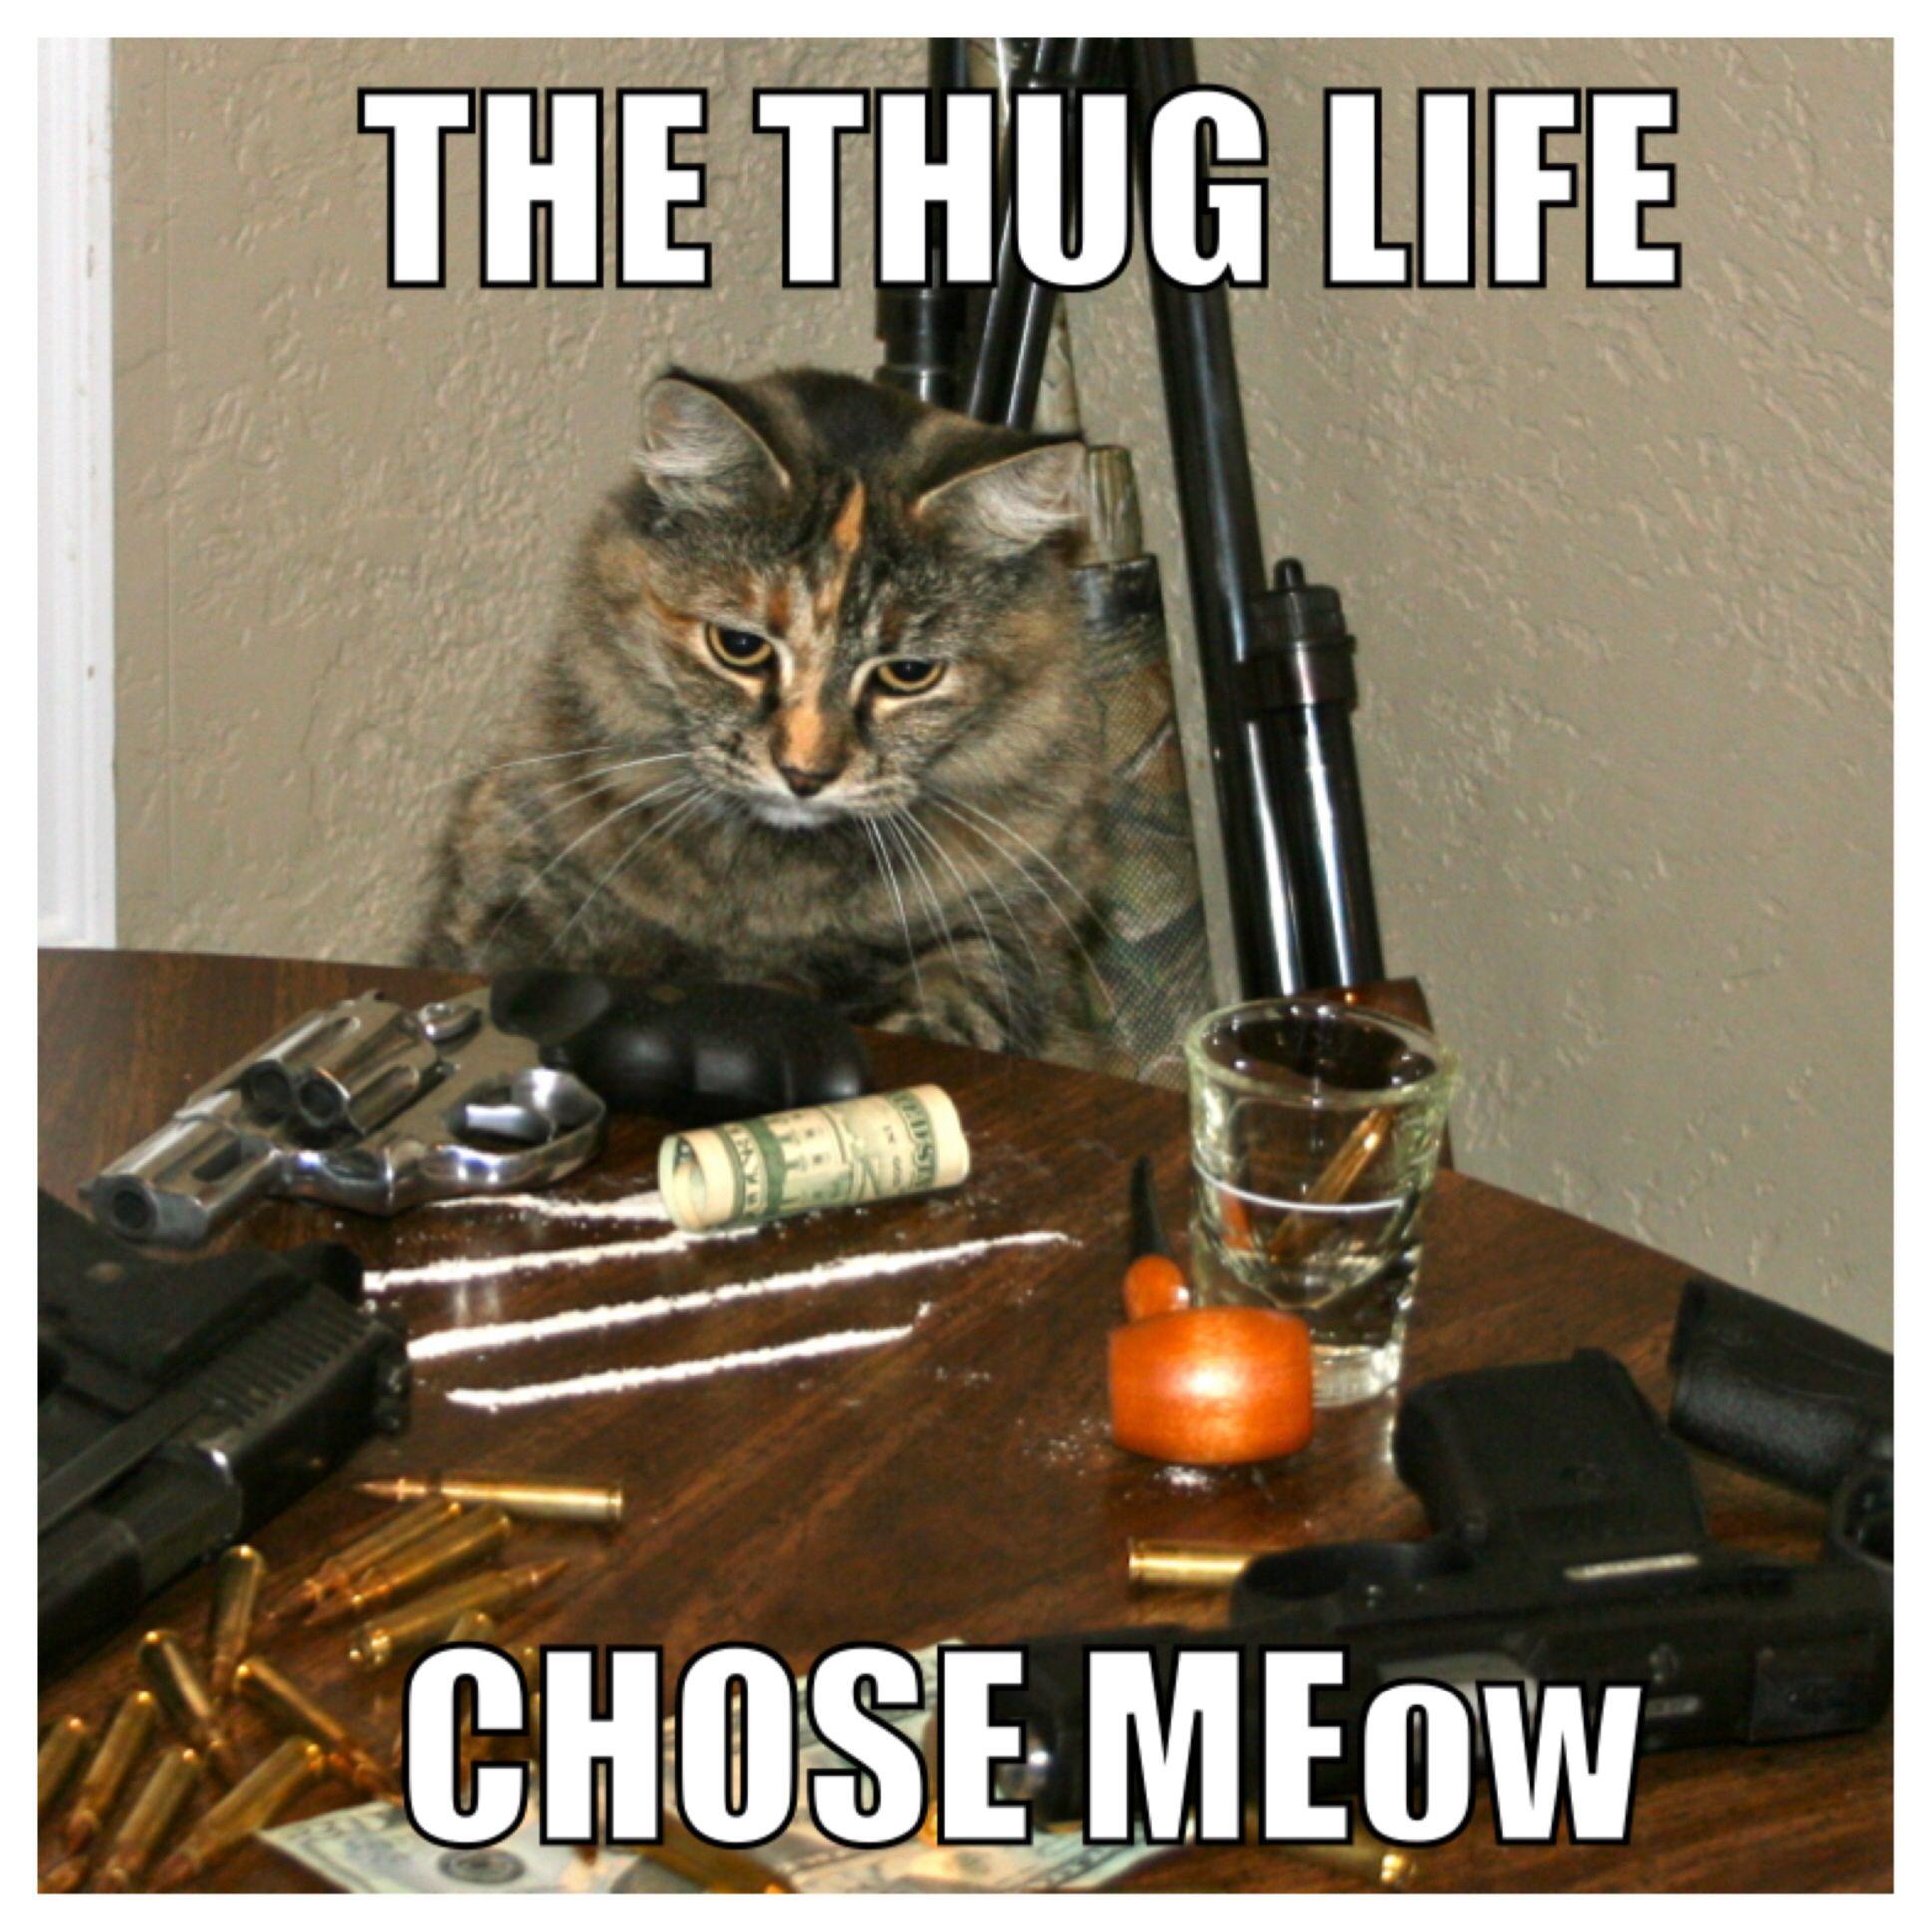 Trap Cat #Cat #Funny #Guns #Badass #Meme